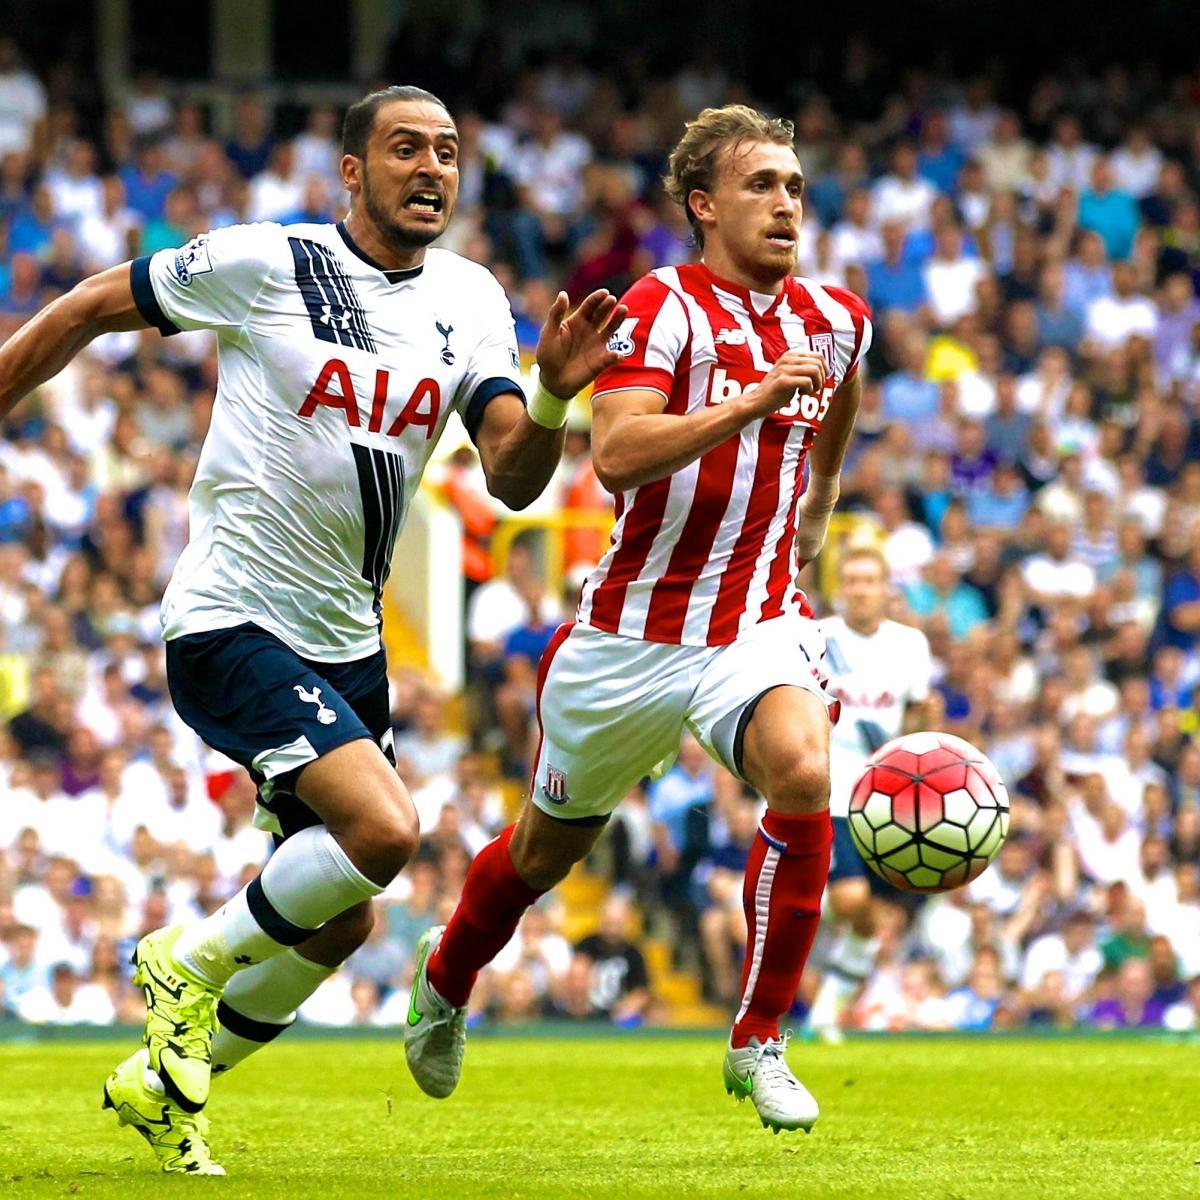 Tottenham Vs Huddersfield Live: Tottenham Vs. Stoke City: Live Score, Highlights From